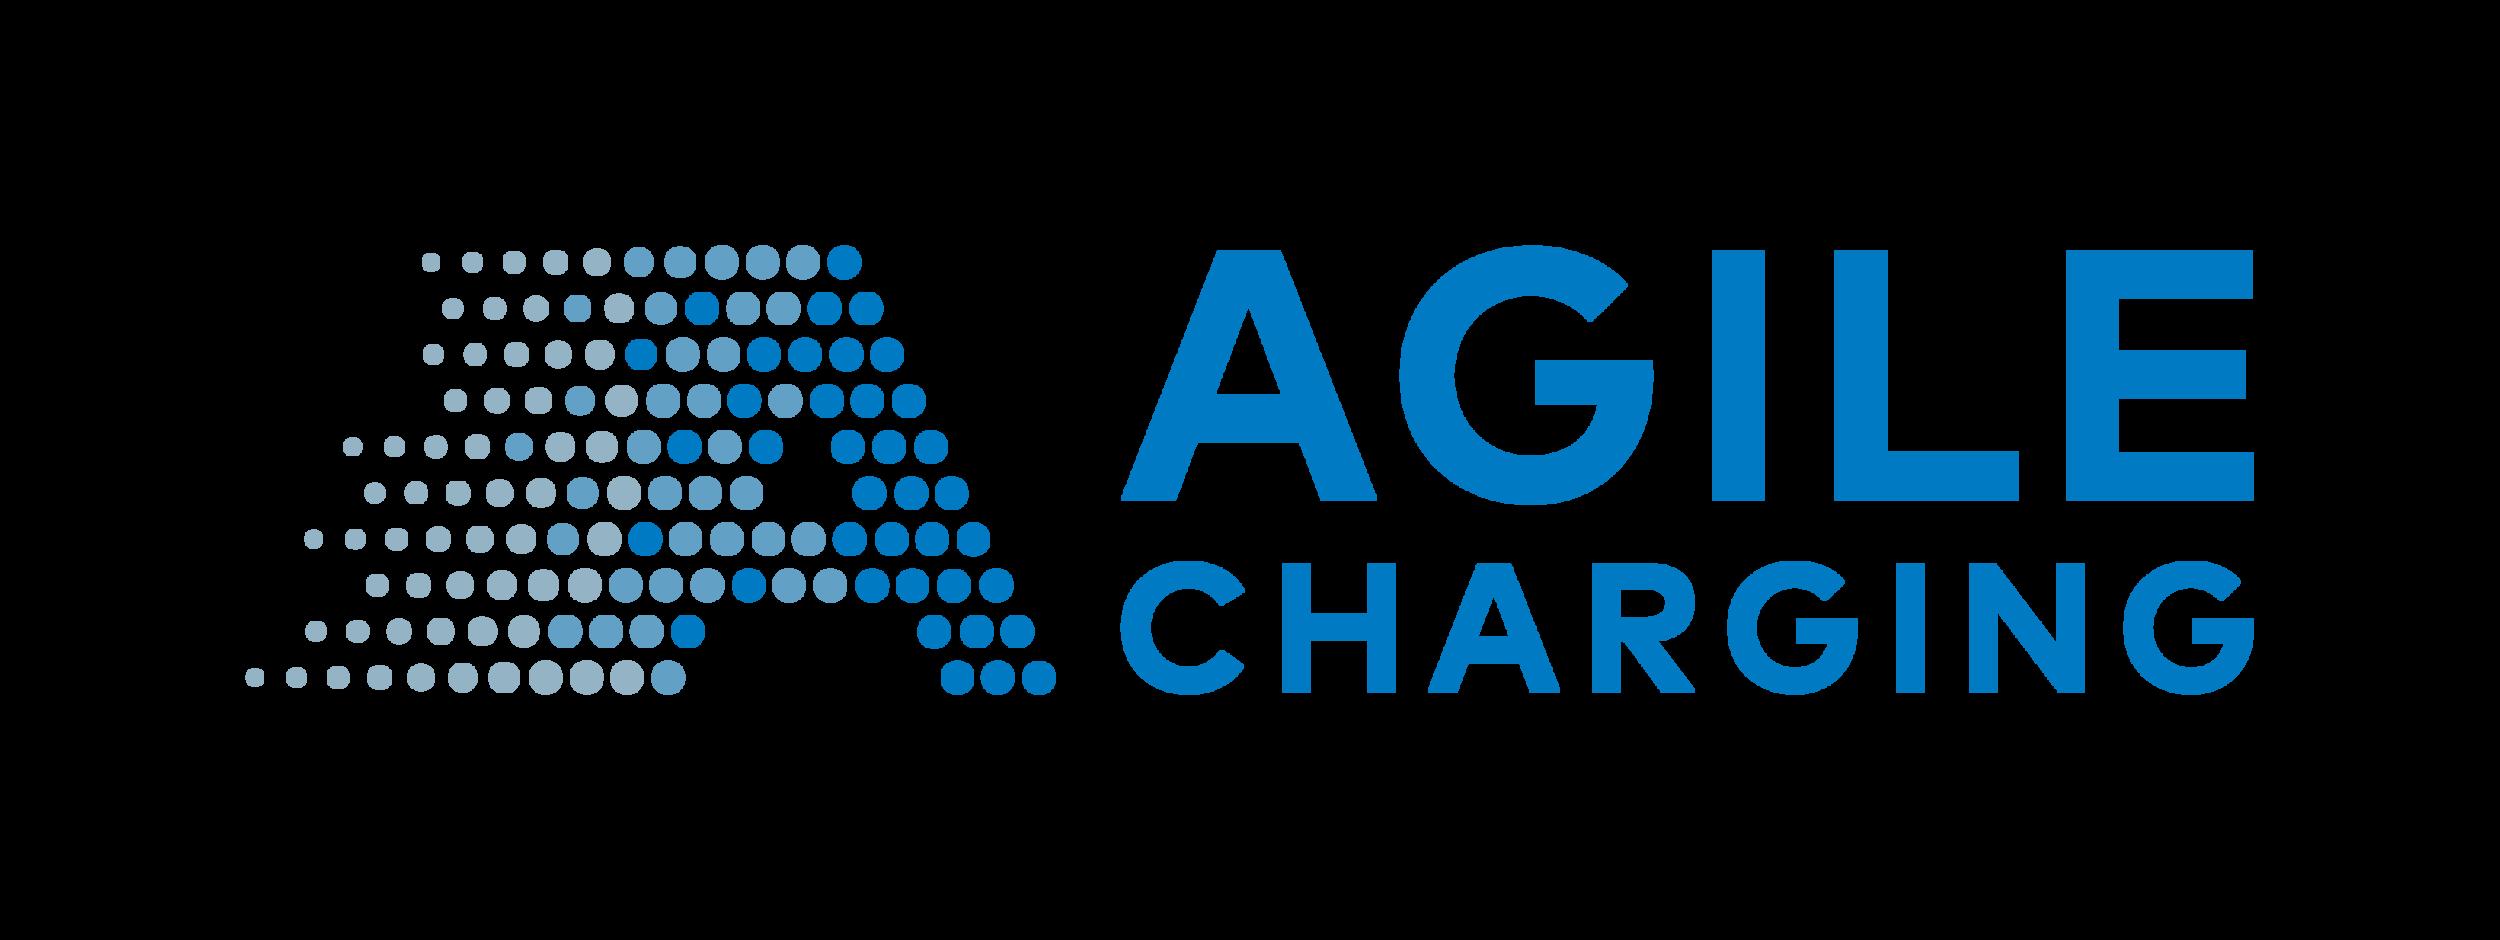 Agile_charging_logo_CMYK.png